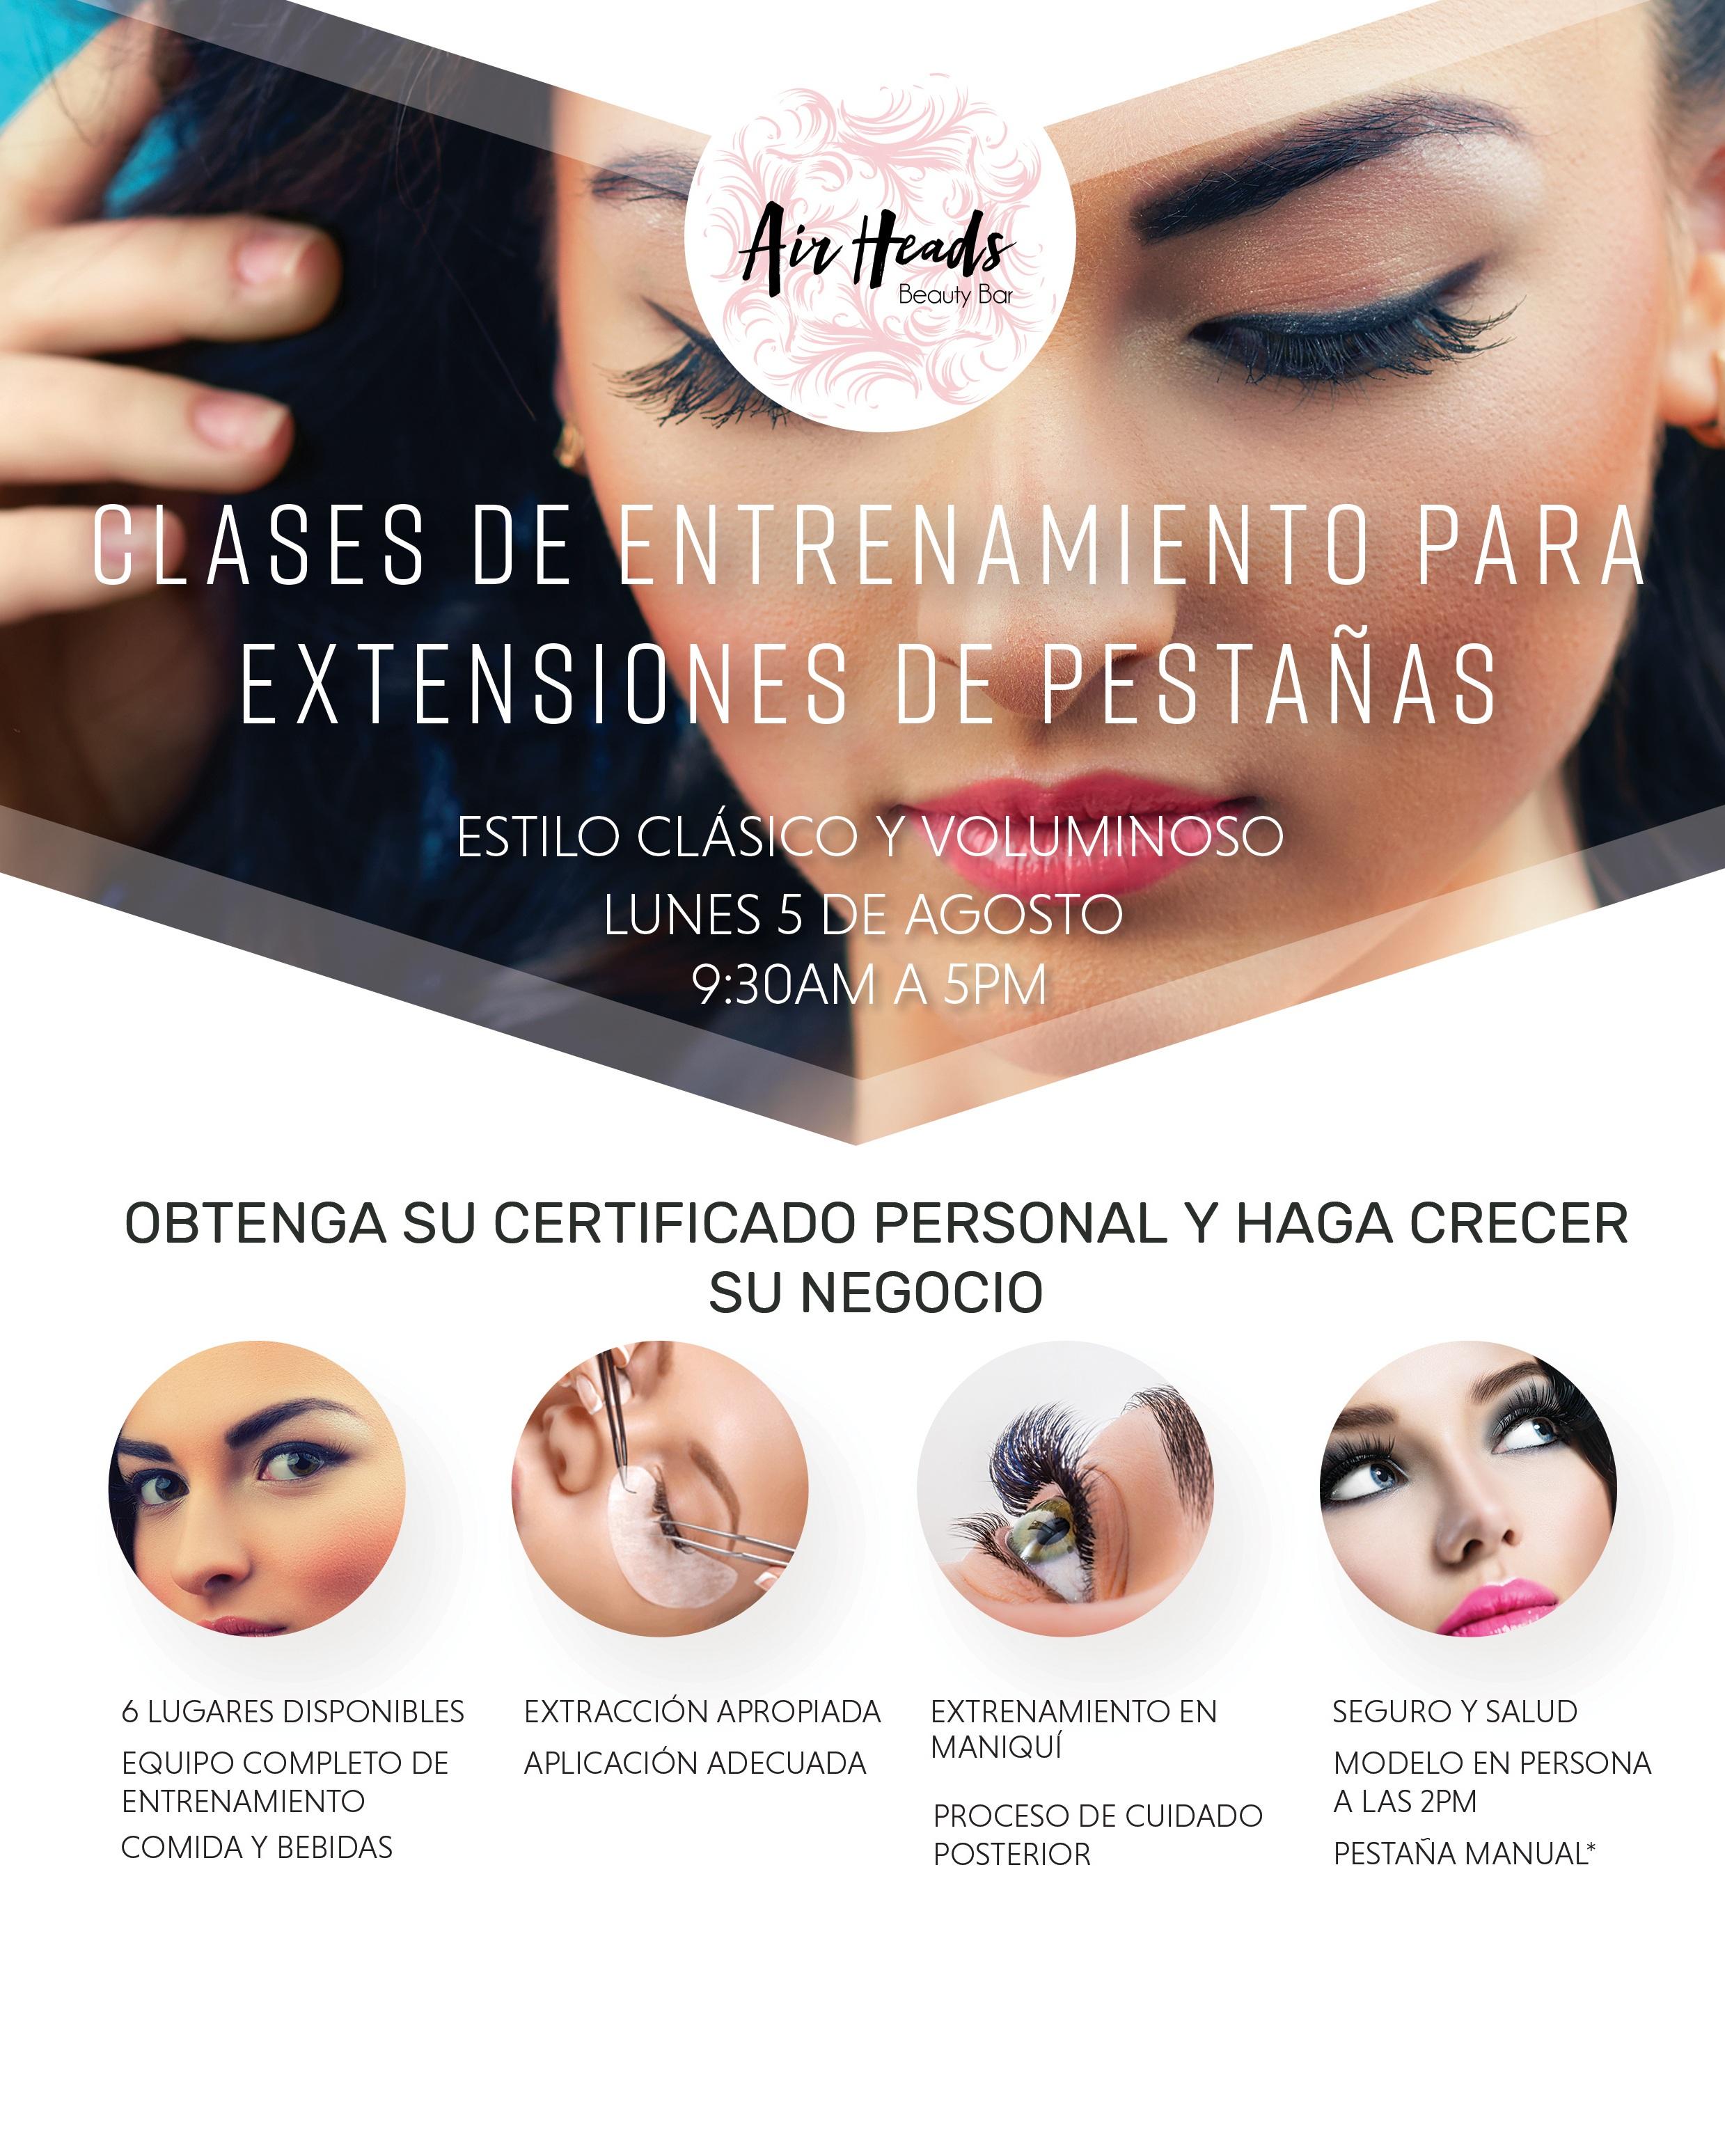 LASH+CLASS+FLIER+SPANISH+PRE+INSTAGRAM+AUG5.jpg